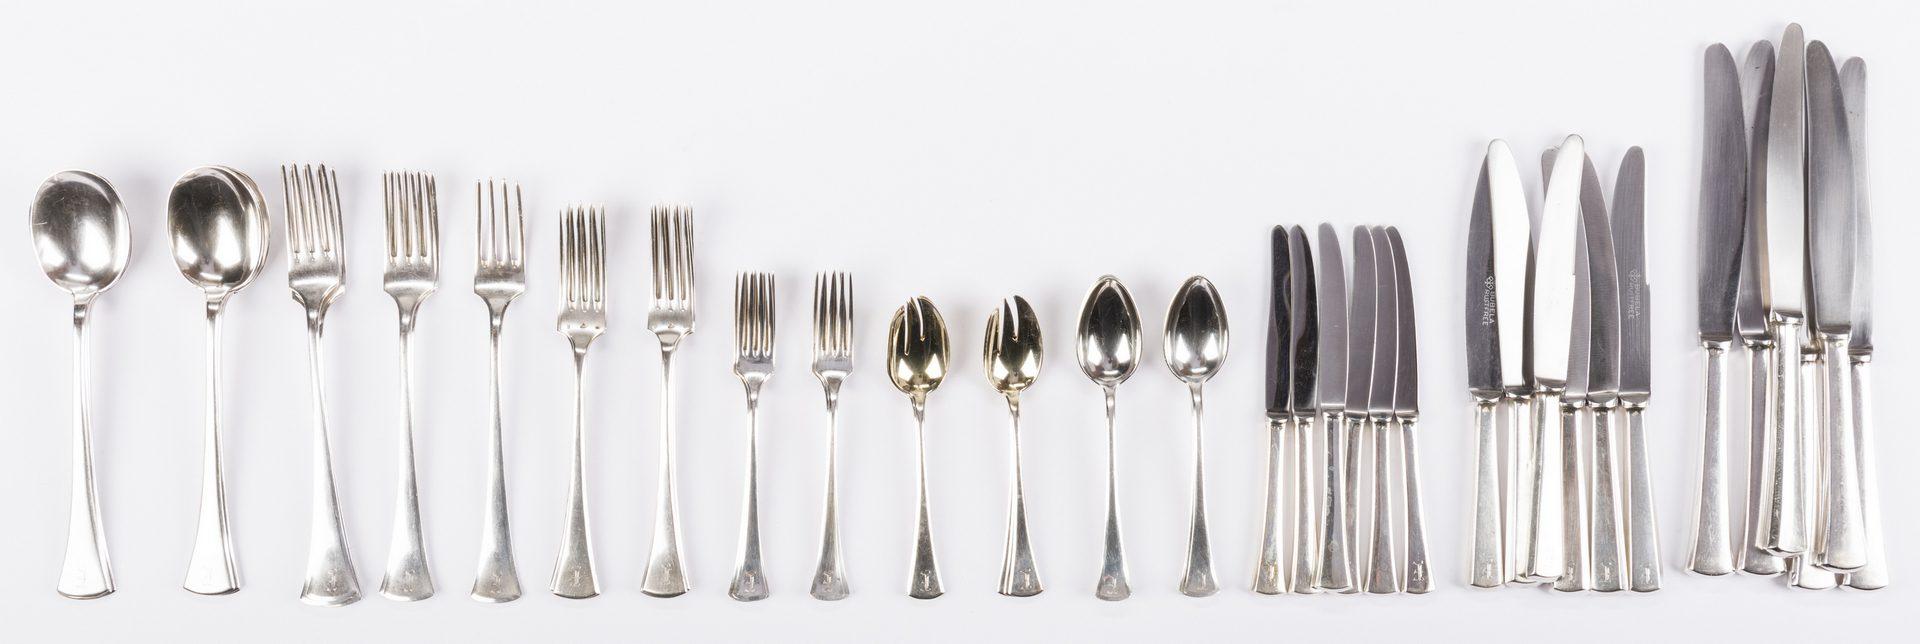 Lot 553: 57 Pieces Silver including Art Deco Continental Flatware Set